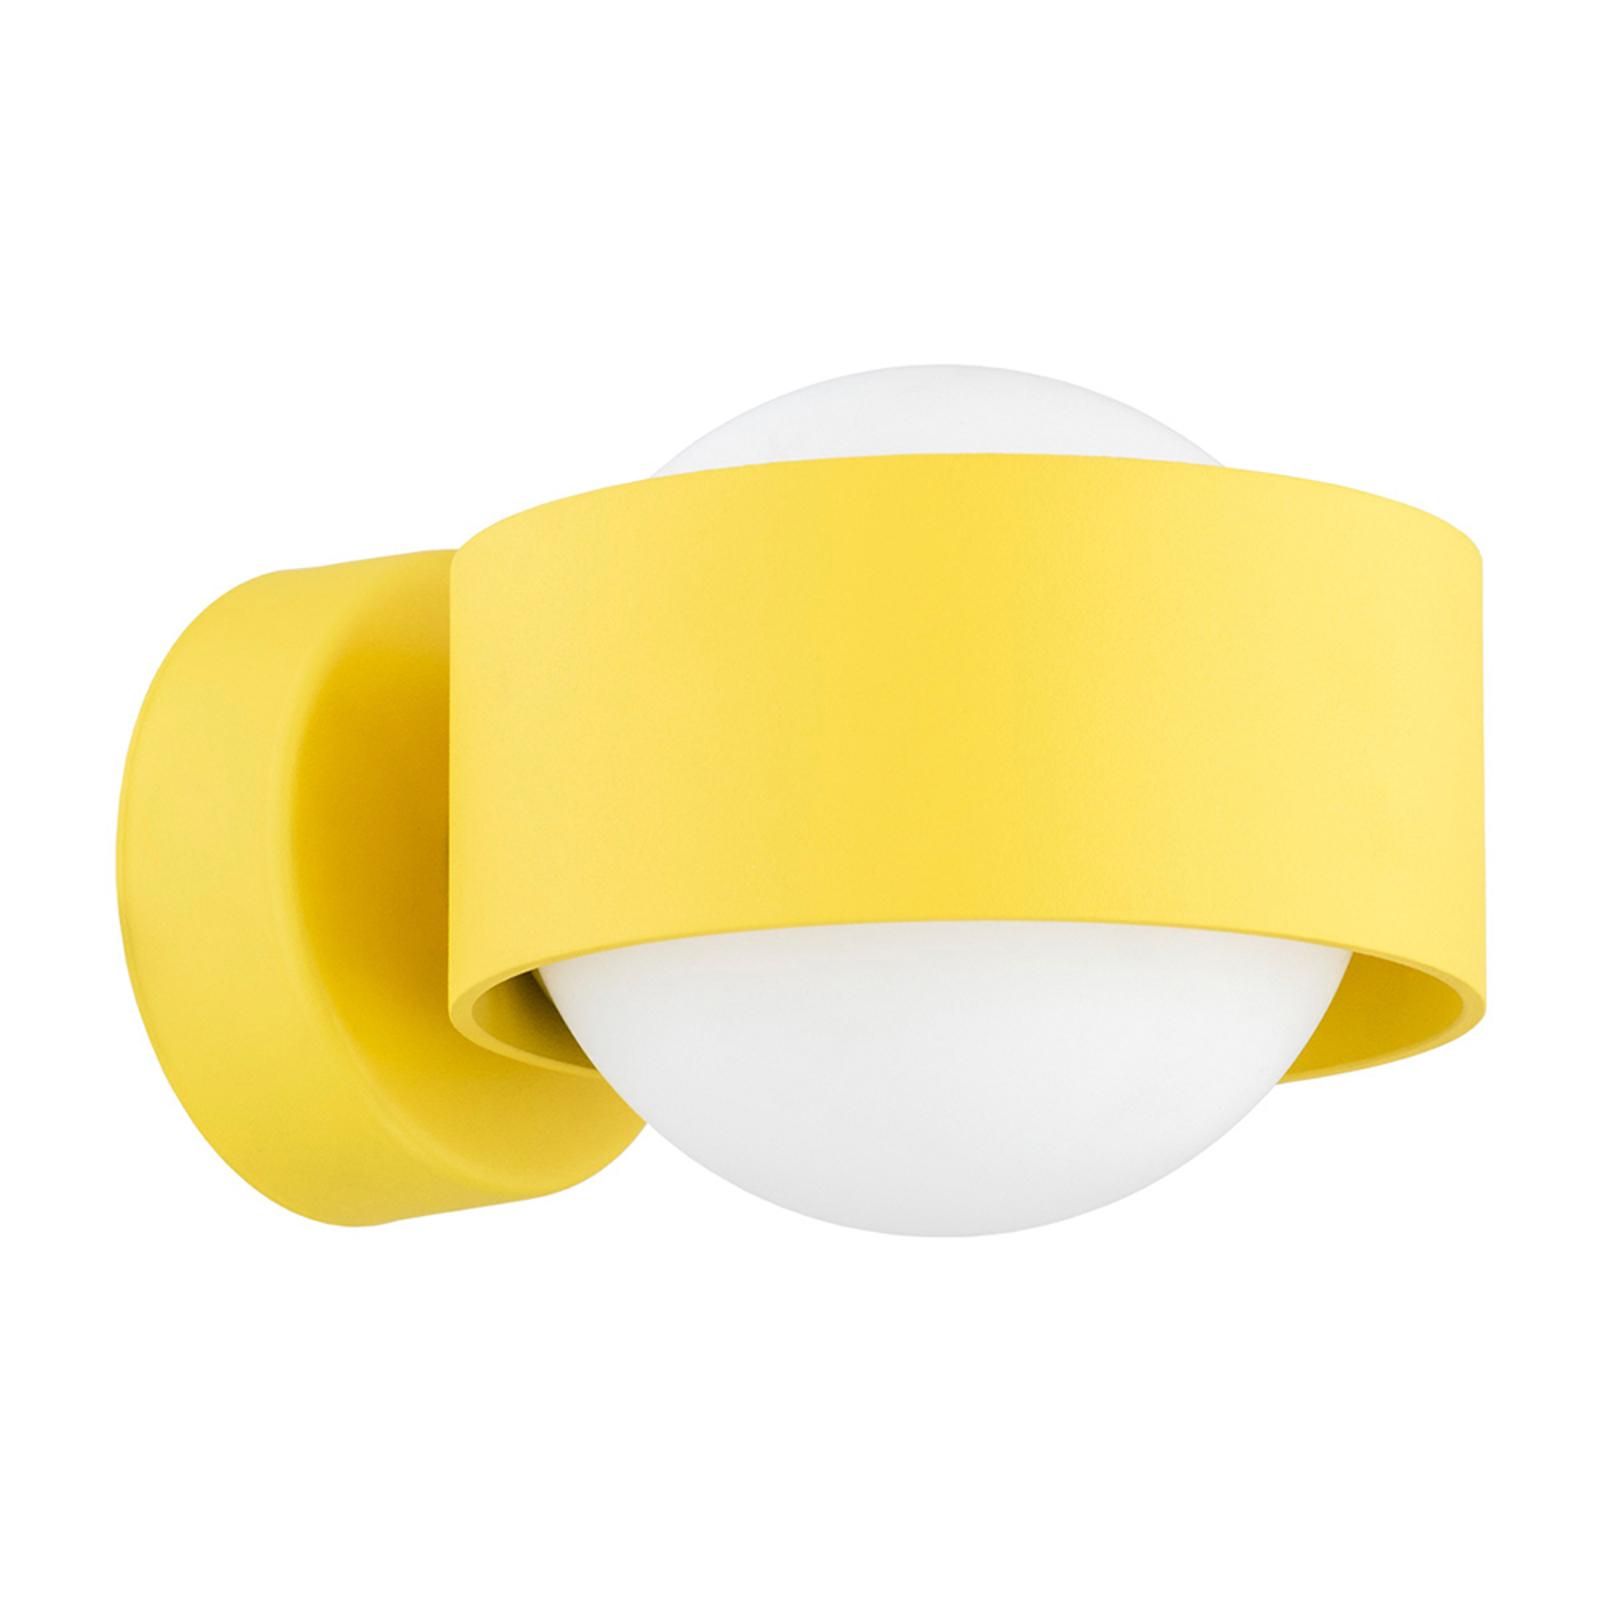 LED-Bad-Wandlampe Macedo, gelb